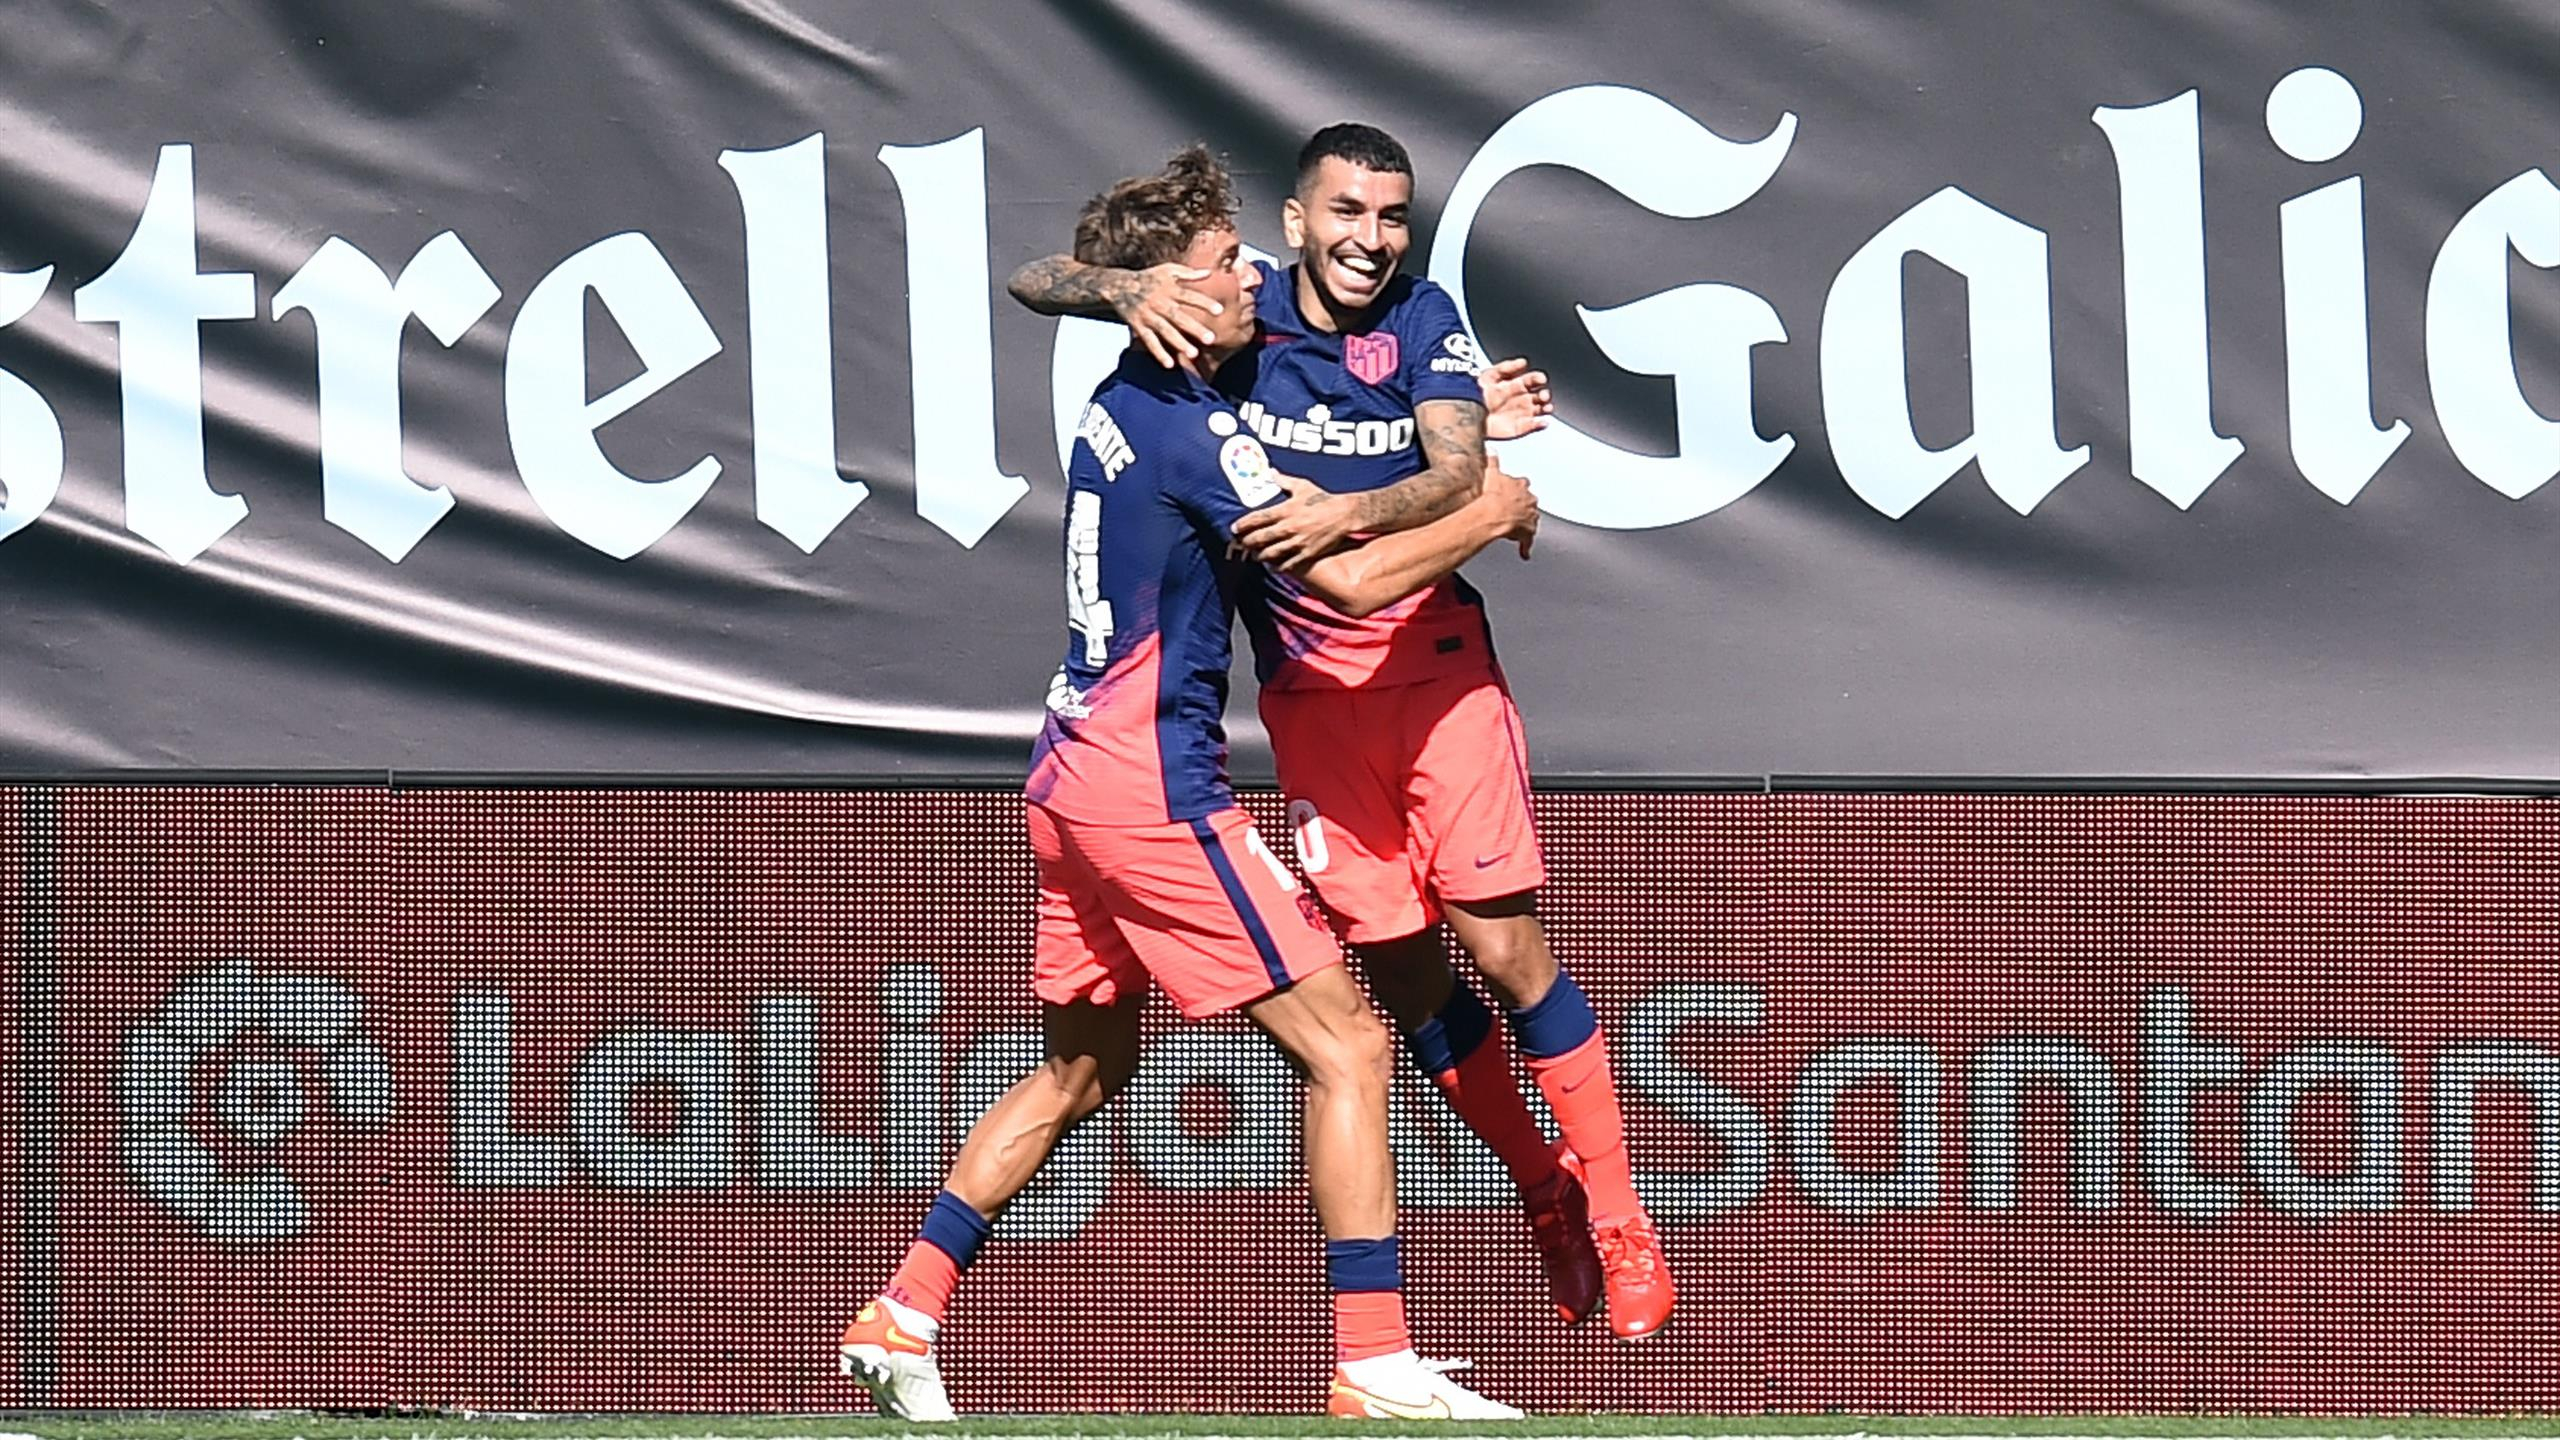 Champions Atletico beat Celta in LaLiga opener